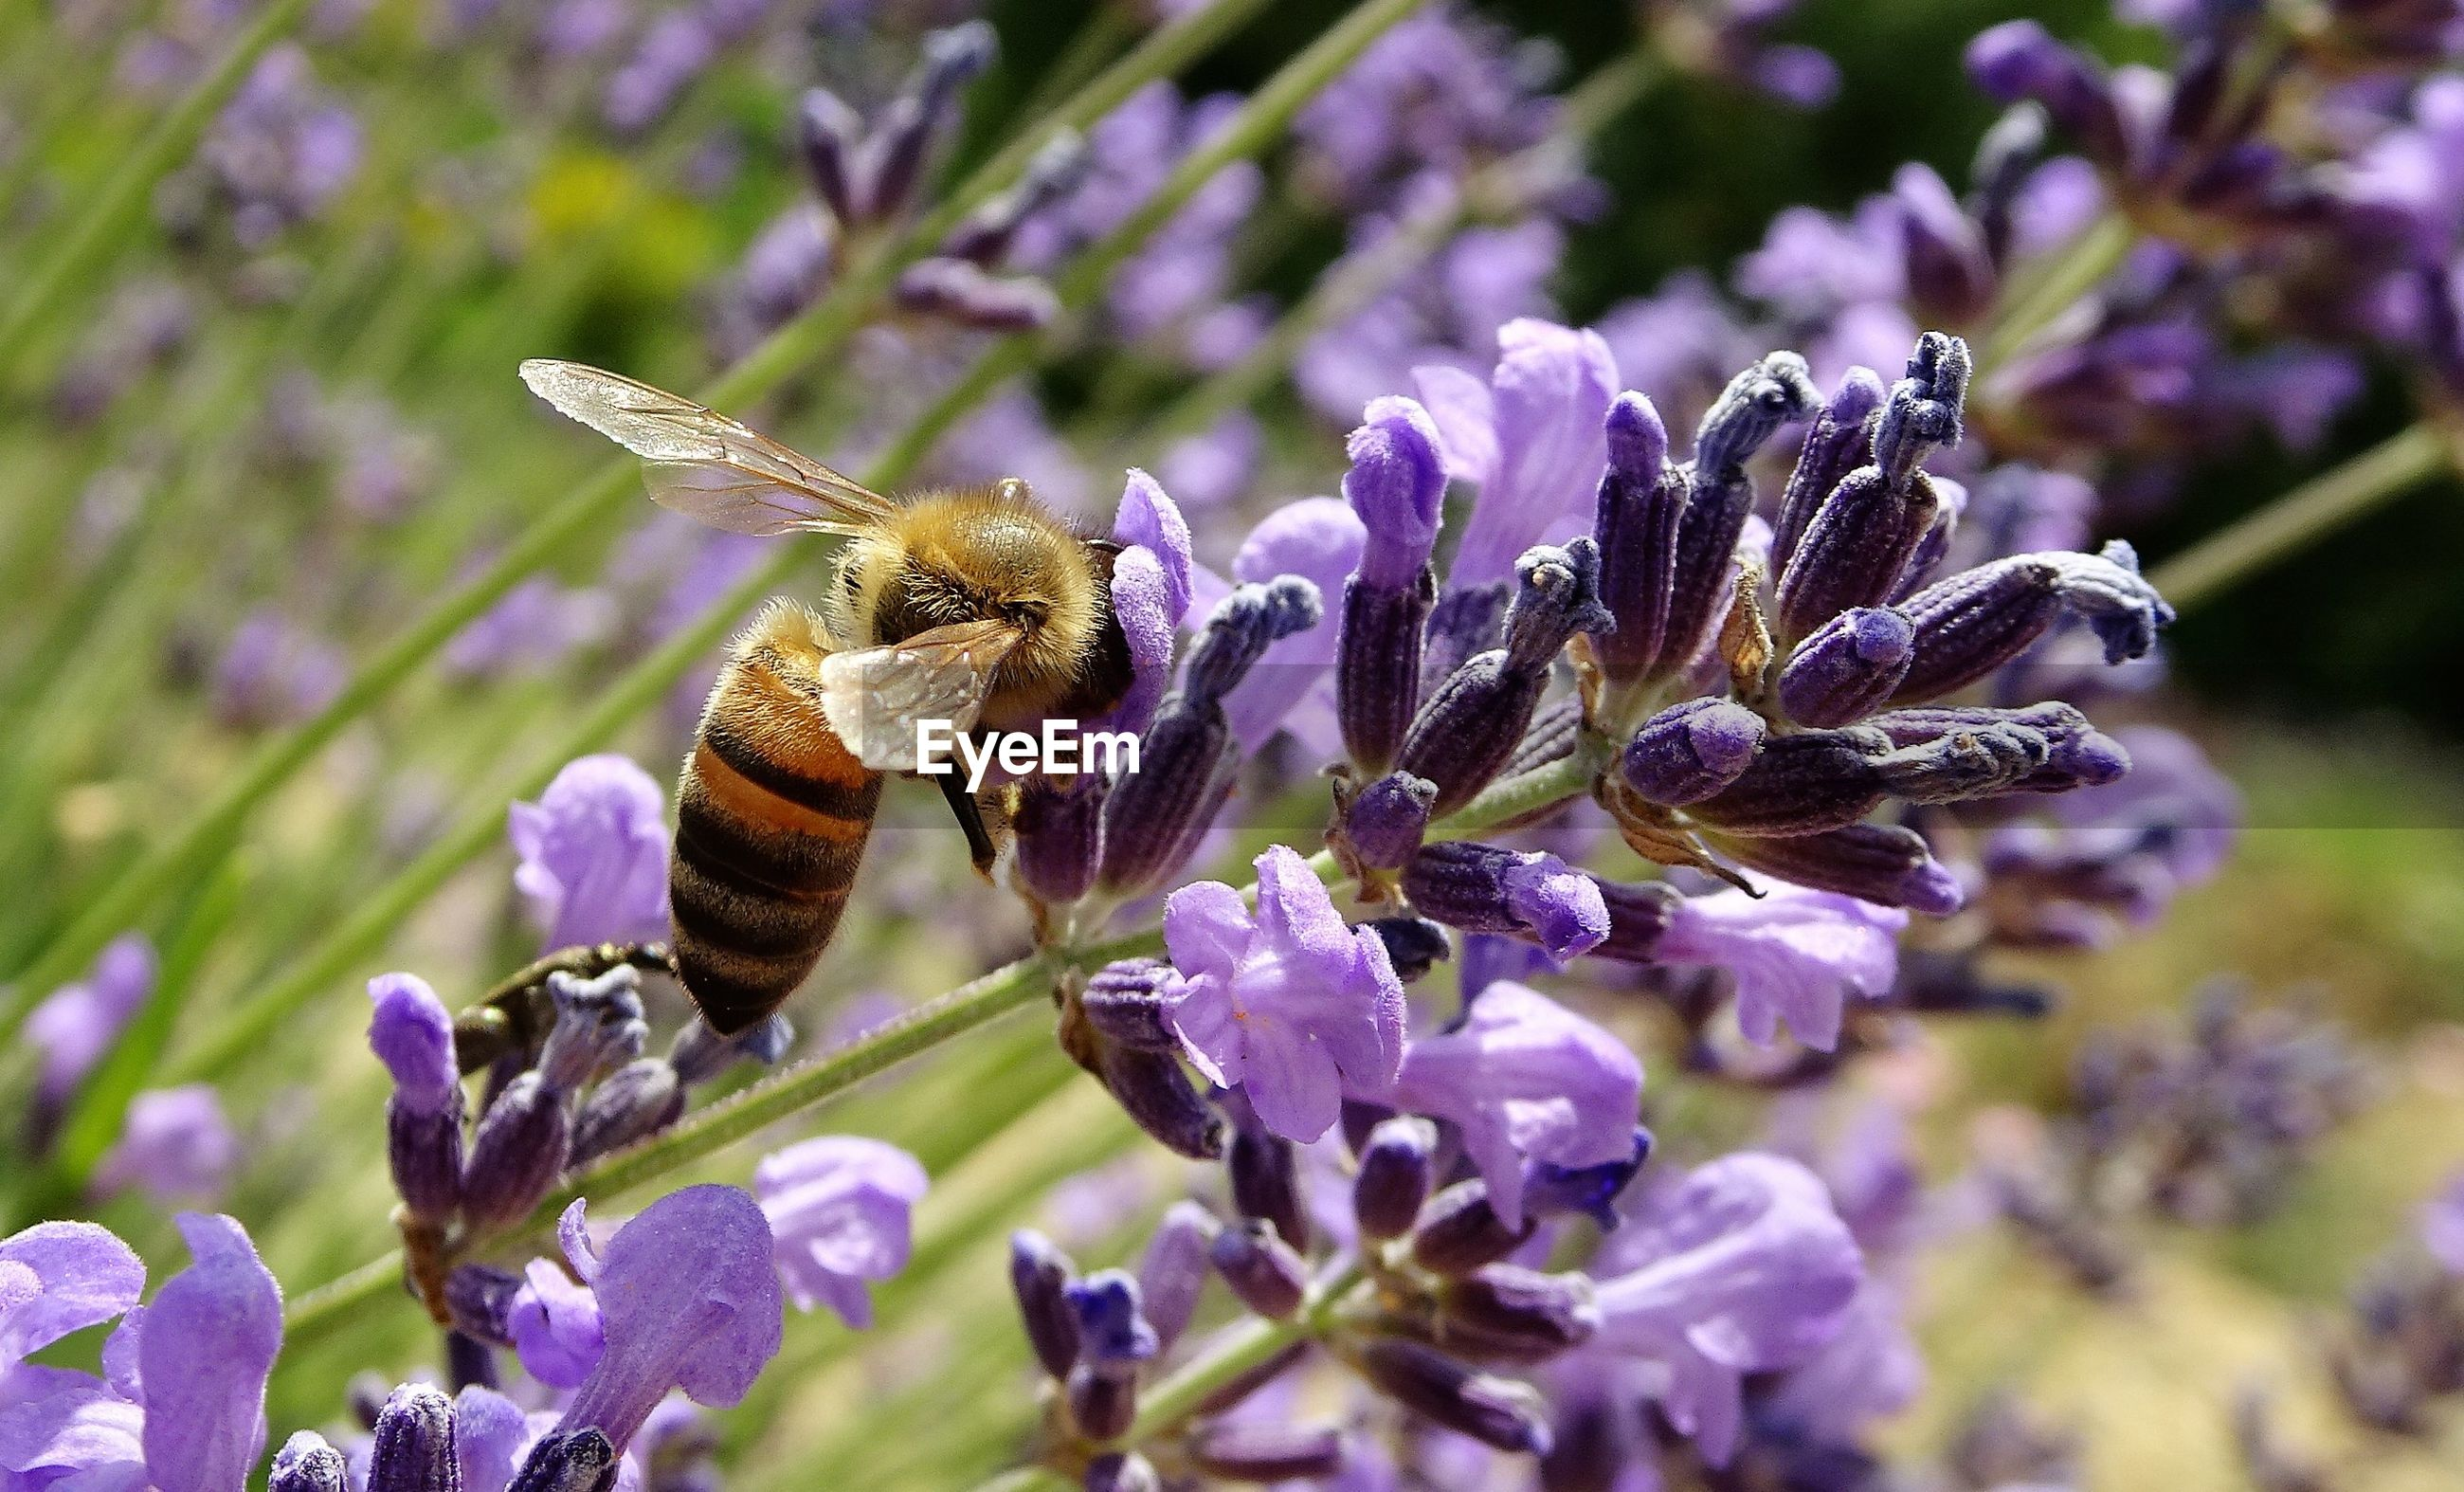 CLOSE-UP OF HONEY BEE ON PURPLE FLOWERS